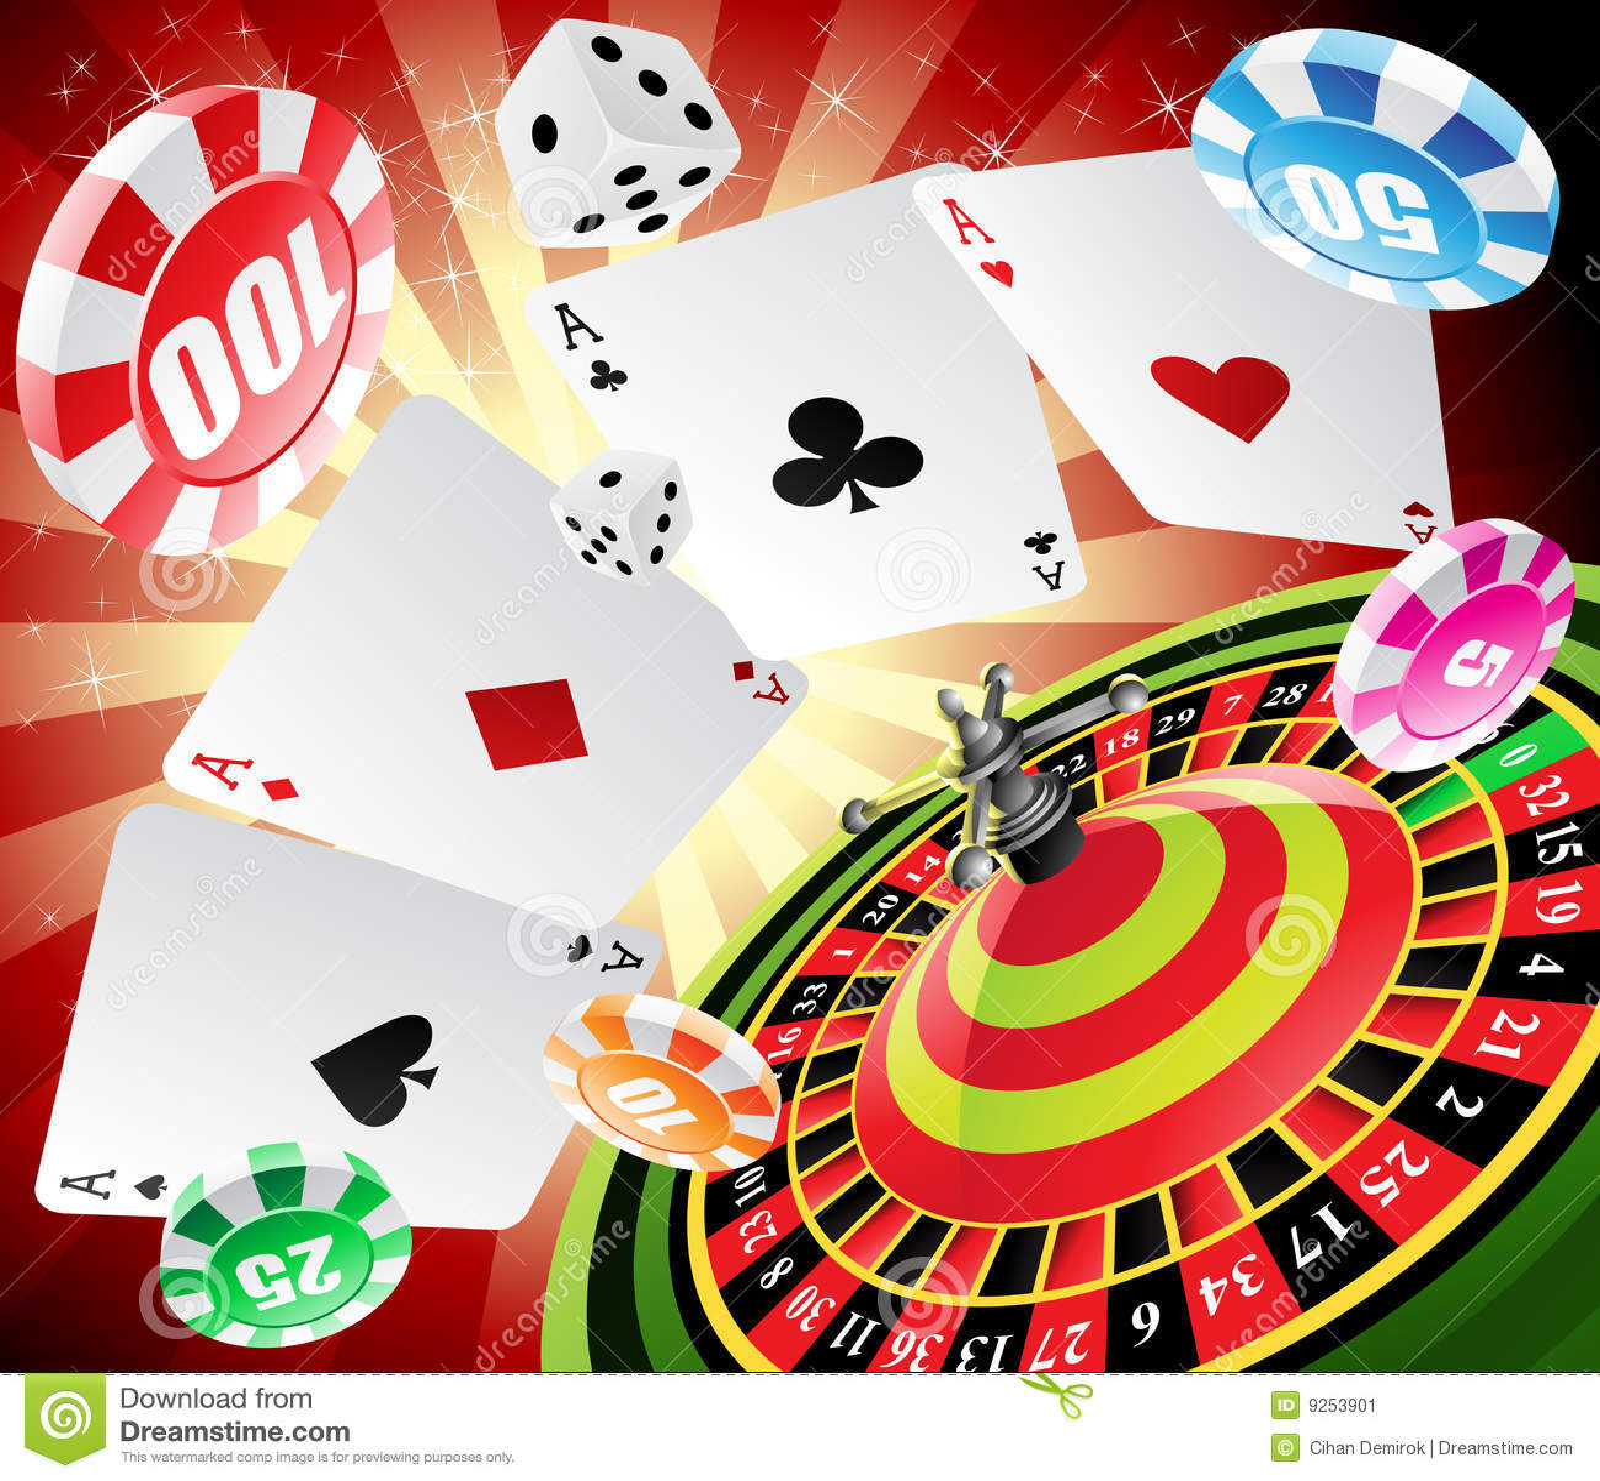 casino online roulette online gambling casino